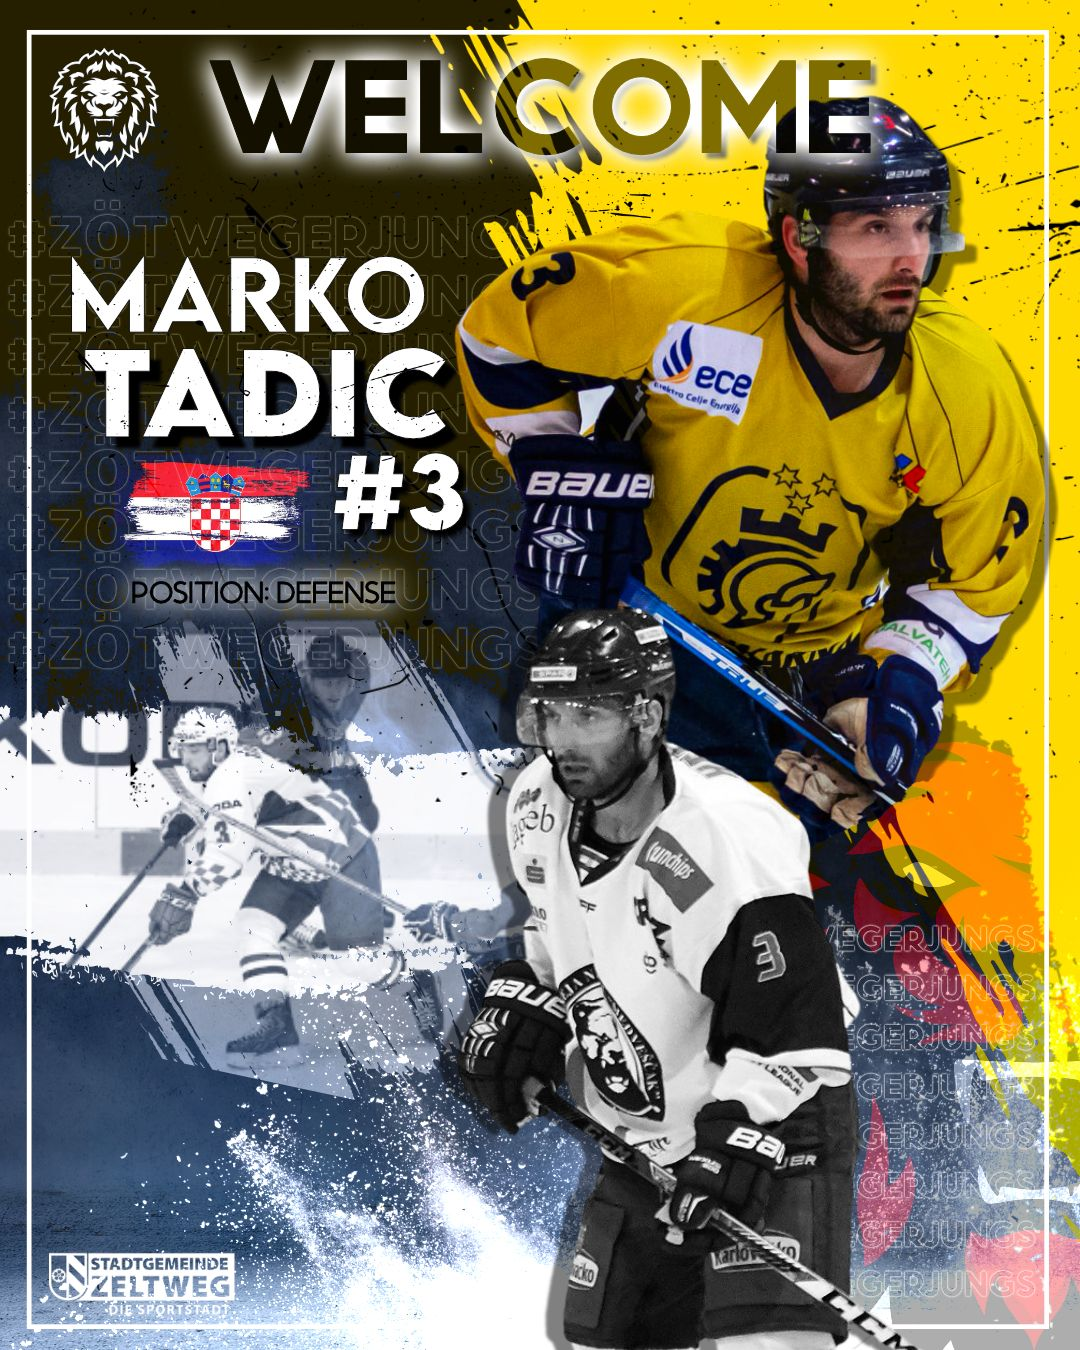 Marko_Tadic